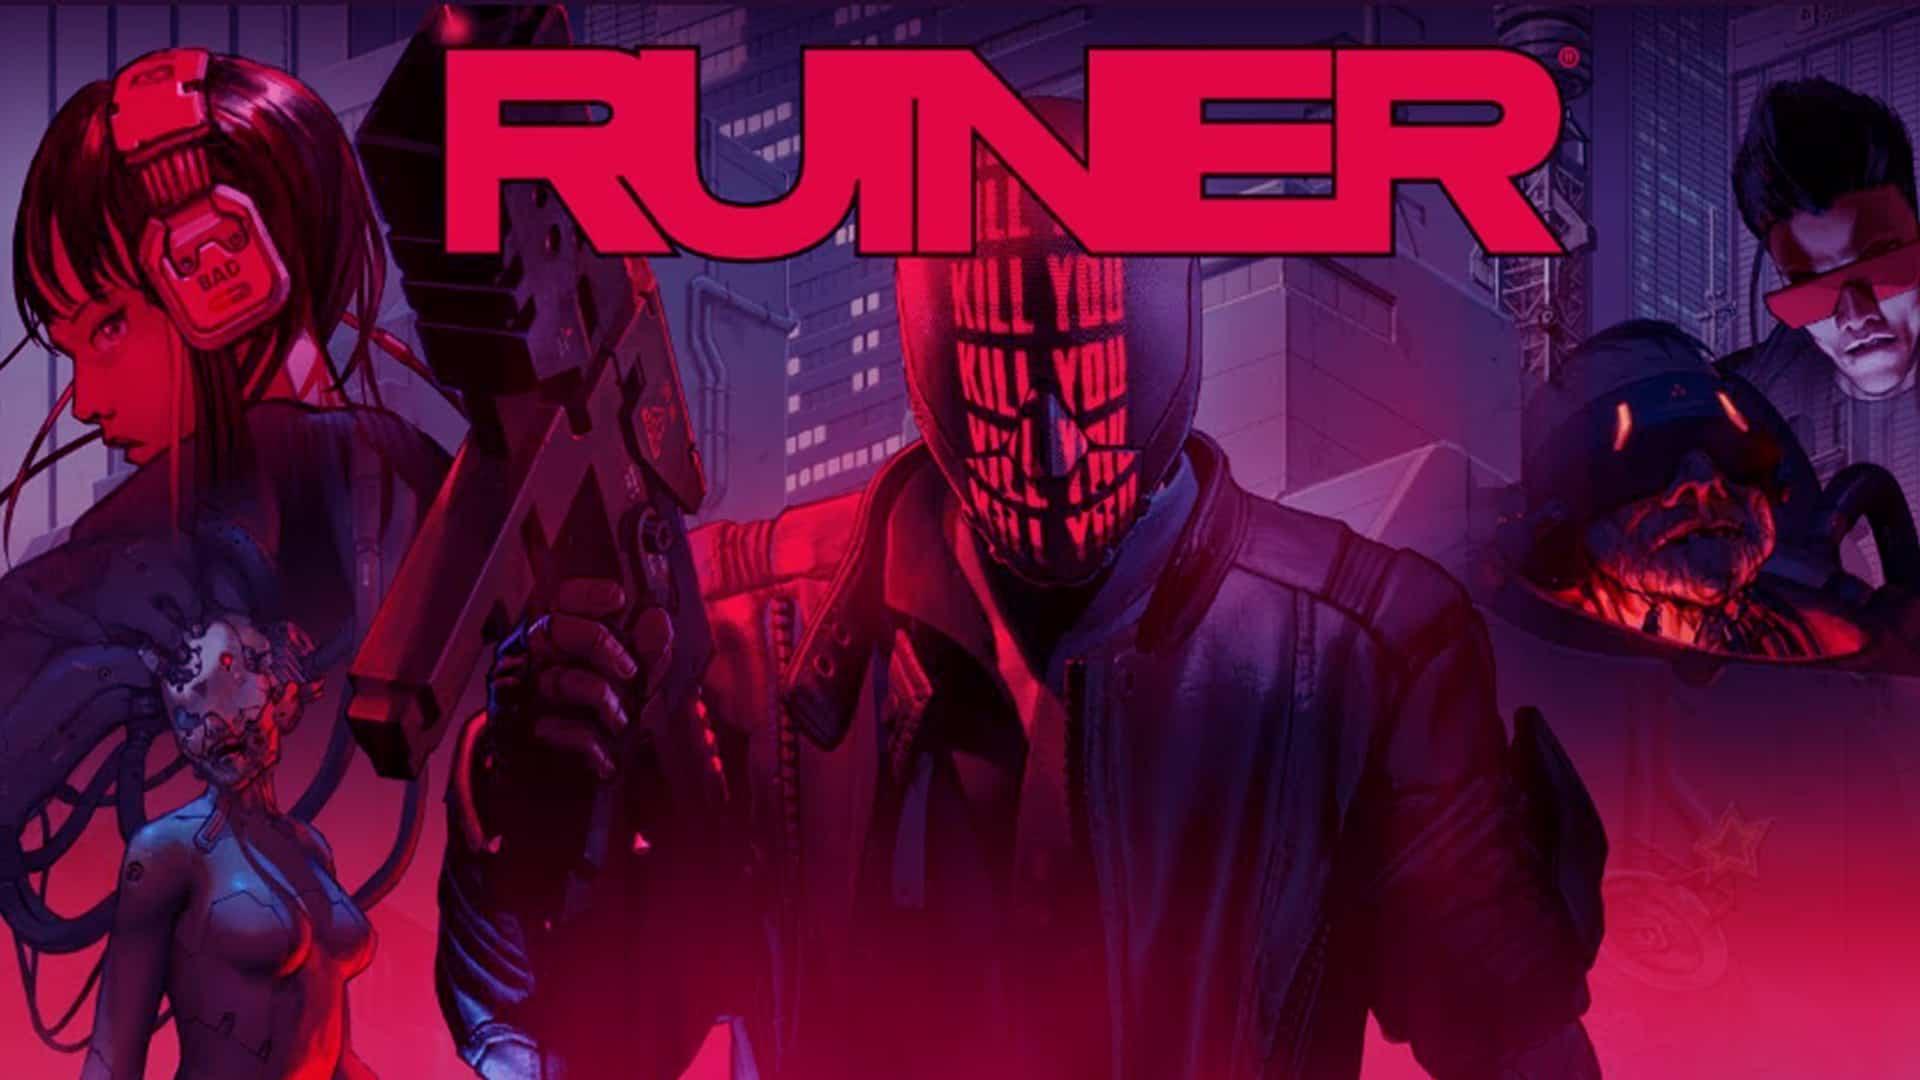 cyberpunk 2077 benzeri oyunlar